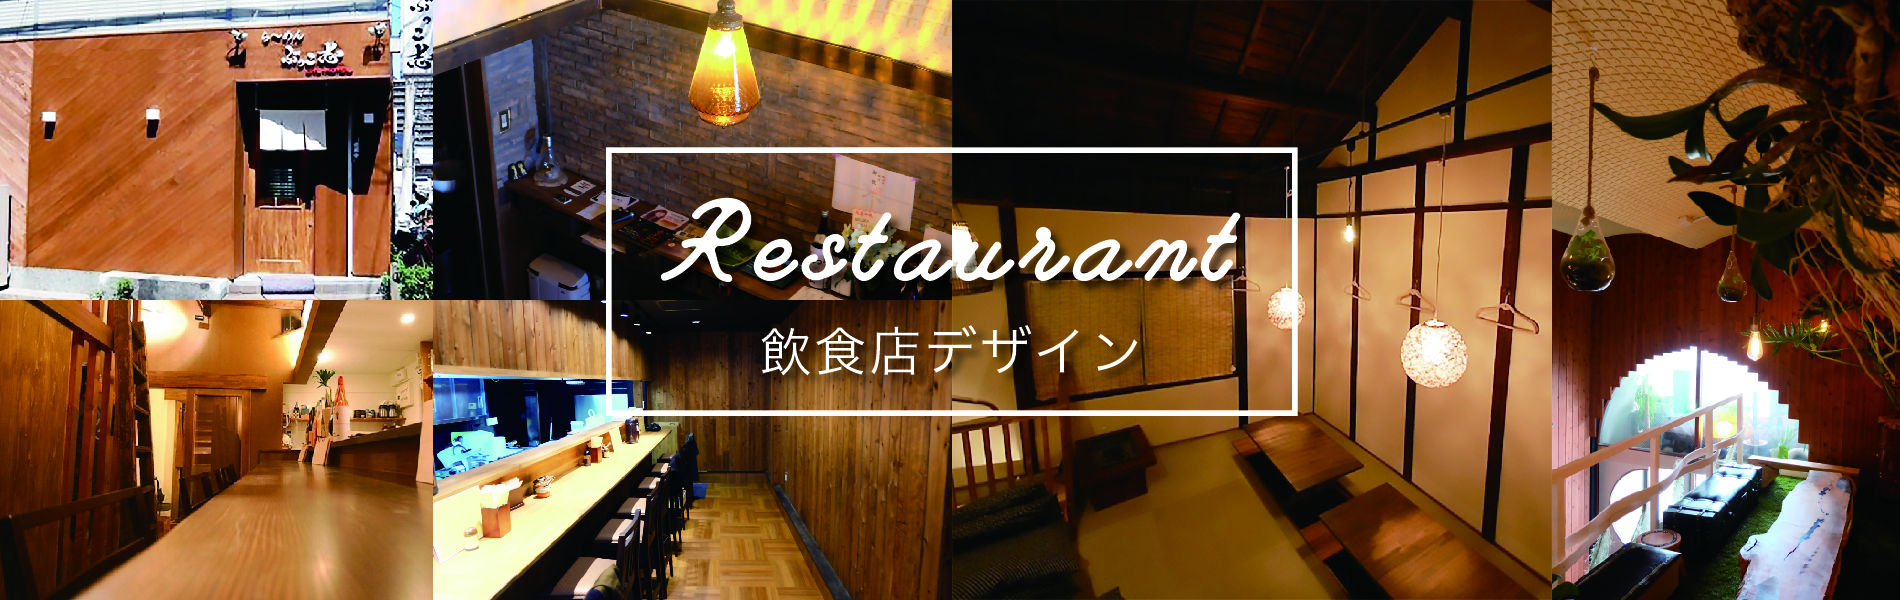 restaurant-header